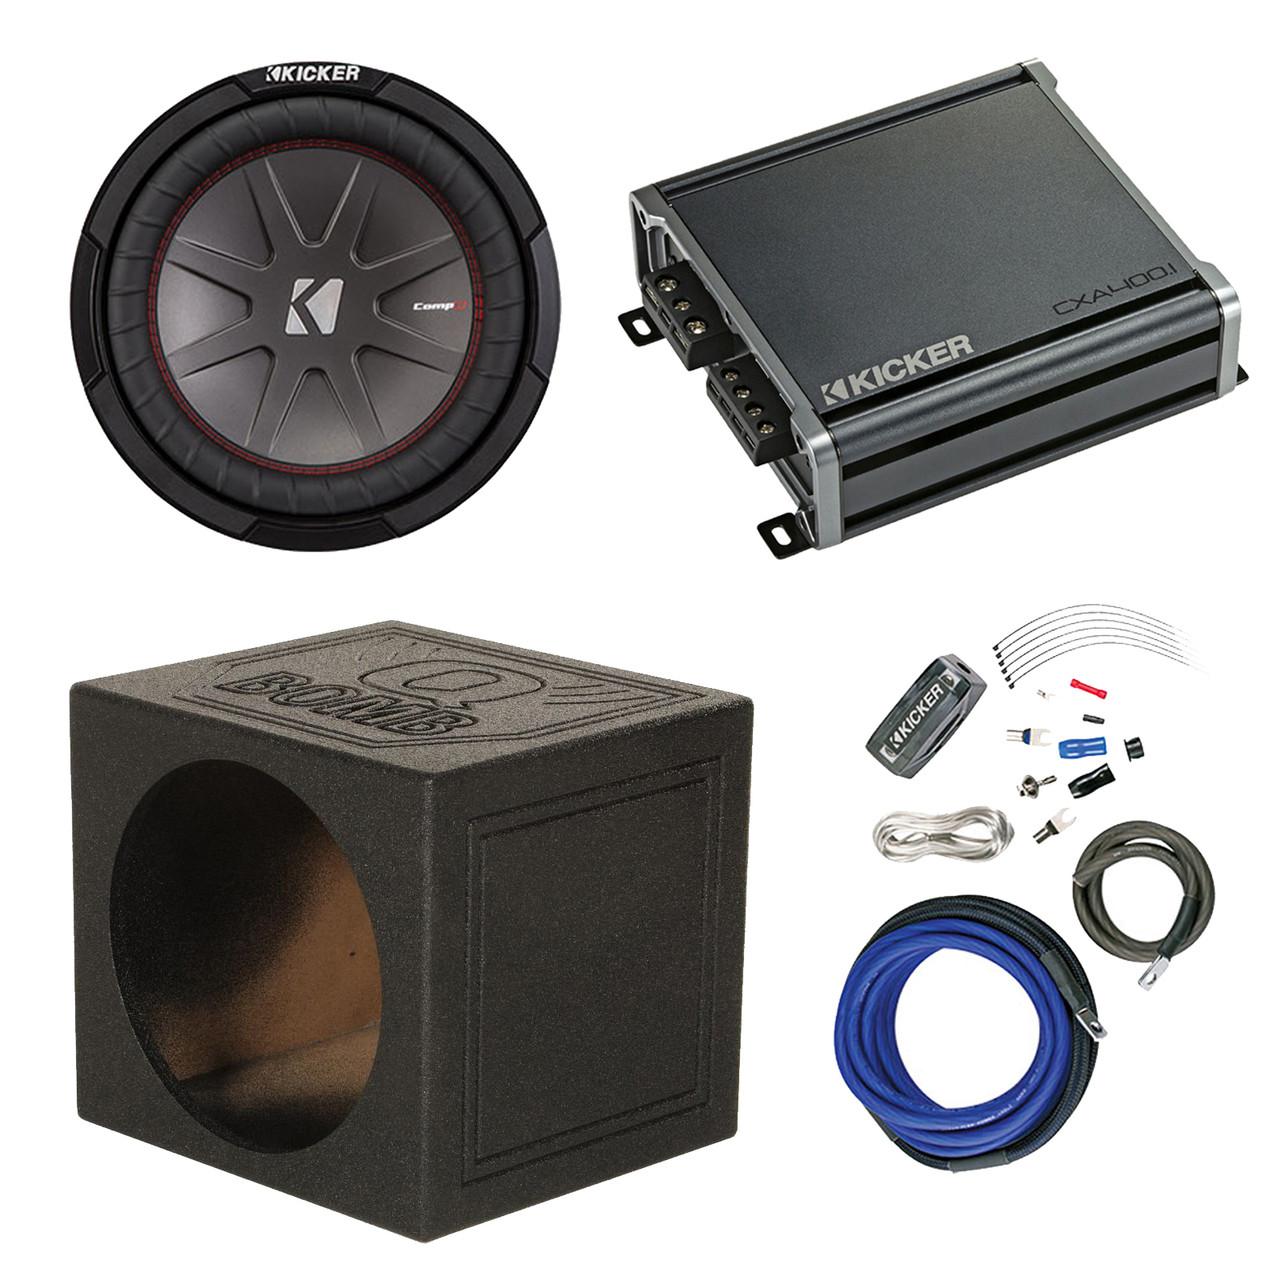 hight resolution of kicker 10 4 ohm car audio subwoofer 600 watt amp 10 sub box amp wiring kit r 43cwr104 1 43cxa3001 road entertainment